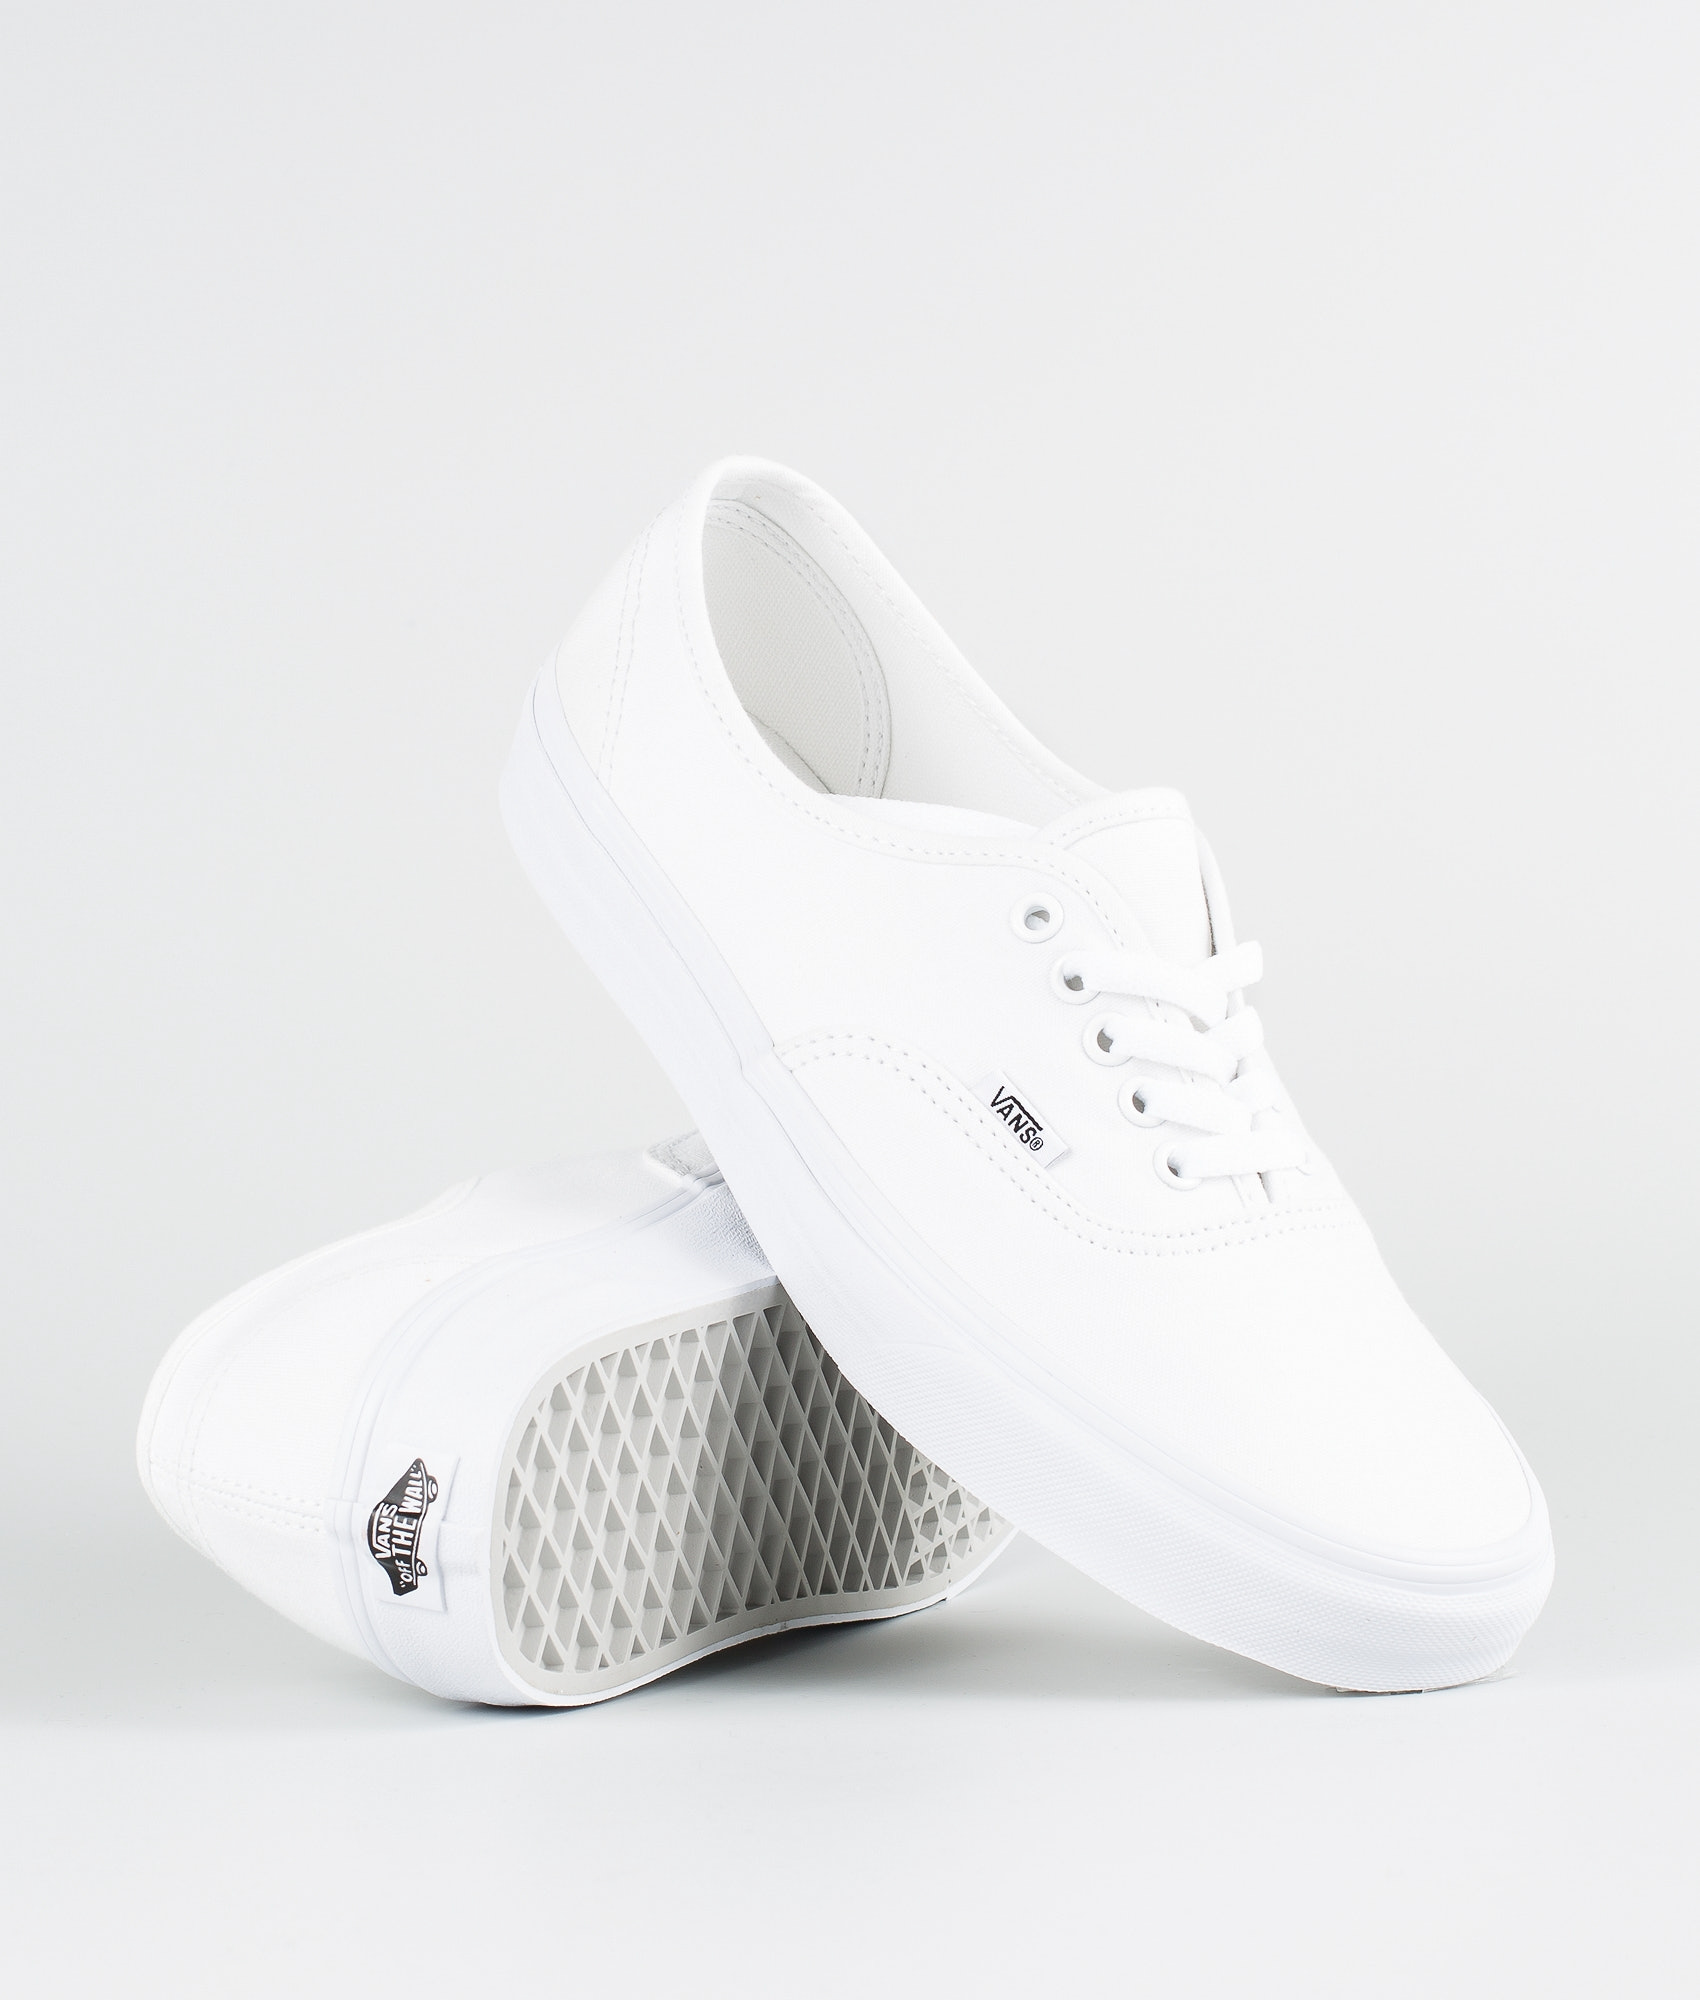 9f7e5fe418 Vans Authentic Shoes True White - Ridestore.com